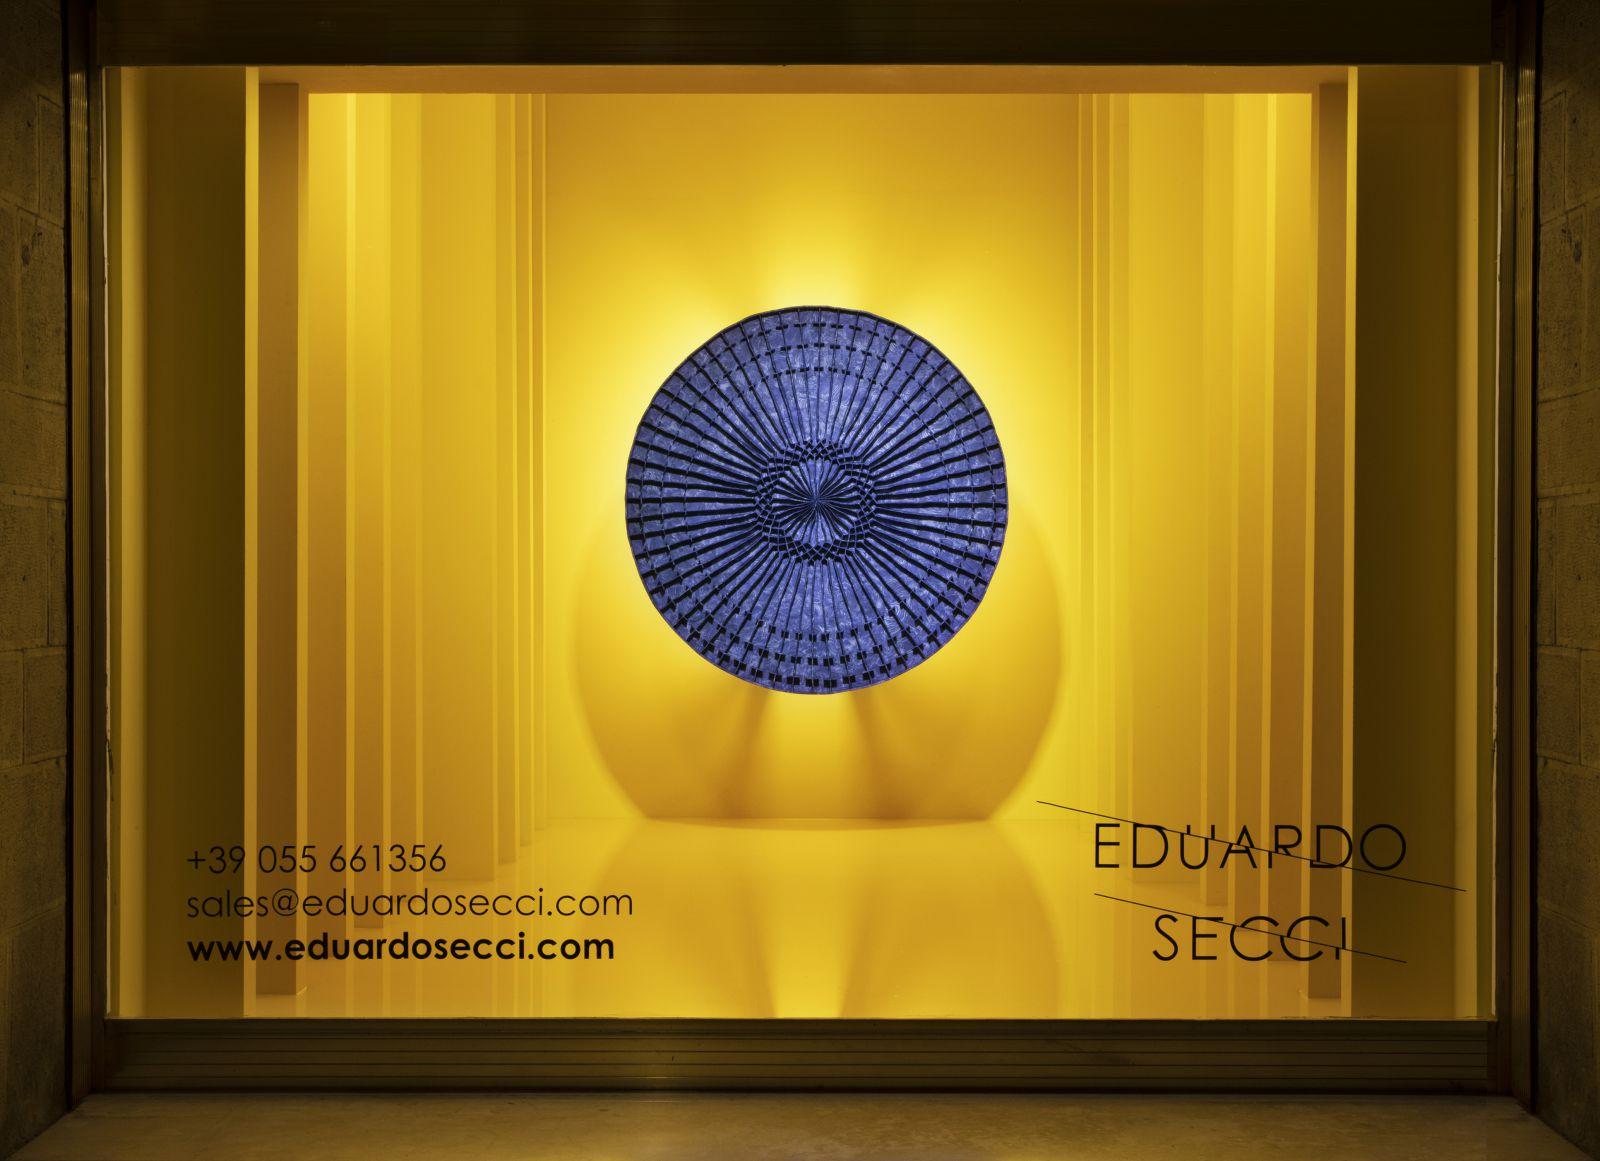 Gallery Eduardo Secci, Florence Italy